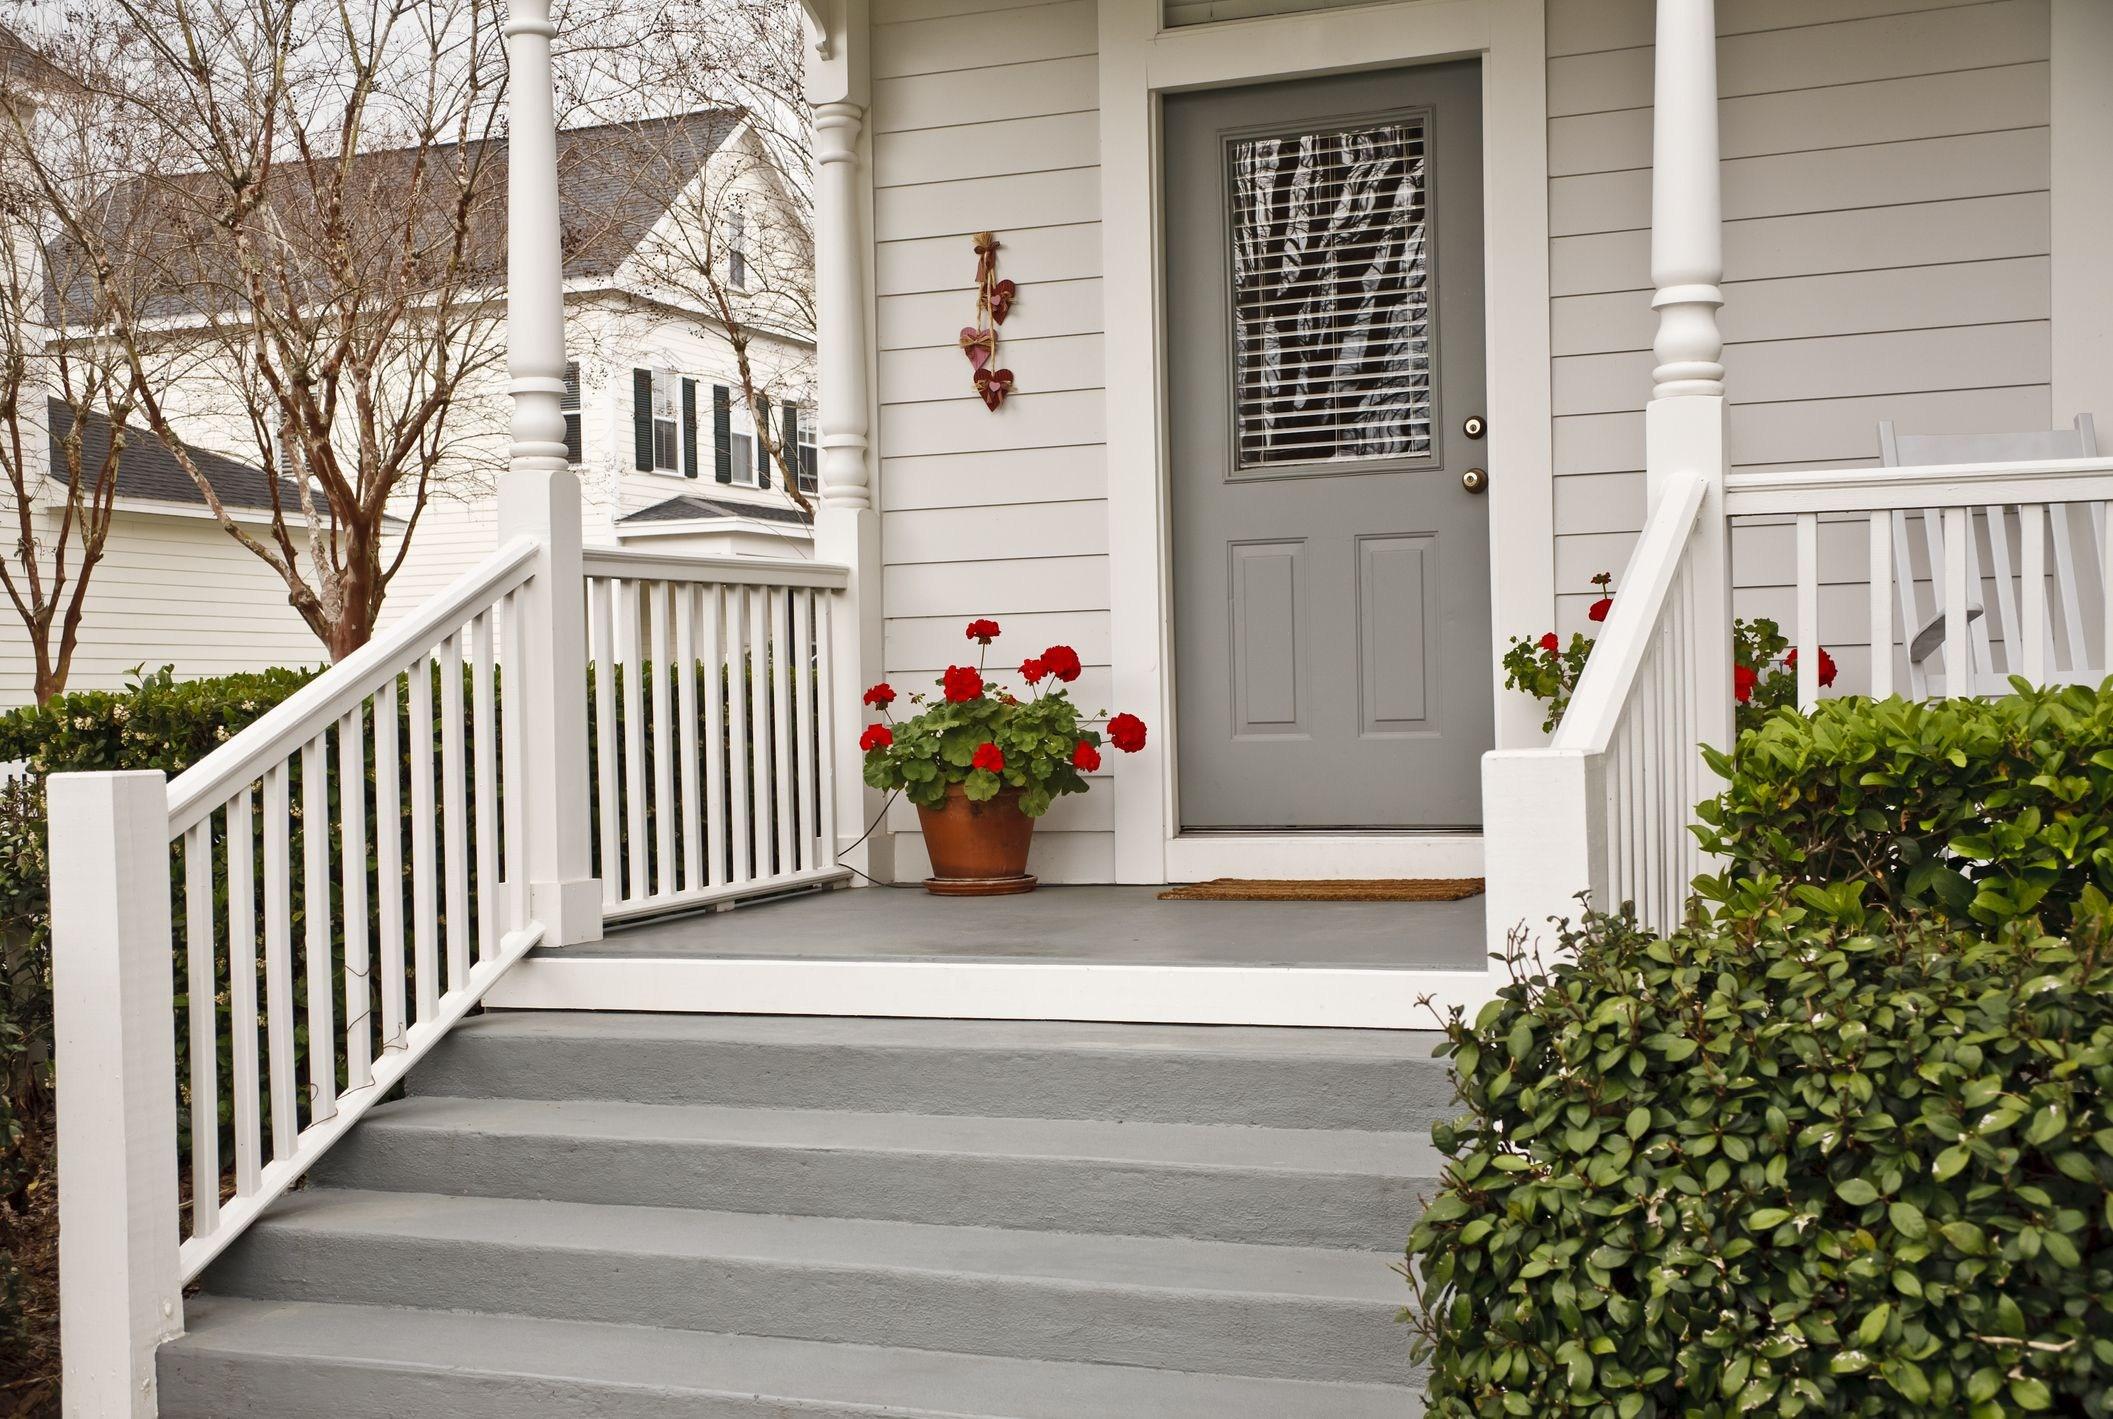 10 Front Door Plant Ideas Best Plants For Your Entrance | Home Entrance Steps Design | Exterior | Sophisticated | Angled | Bungalow Entrance | Concrete